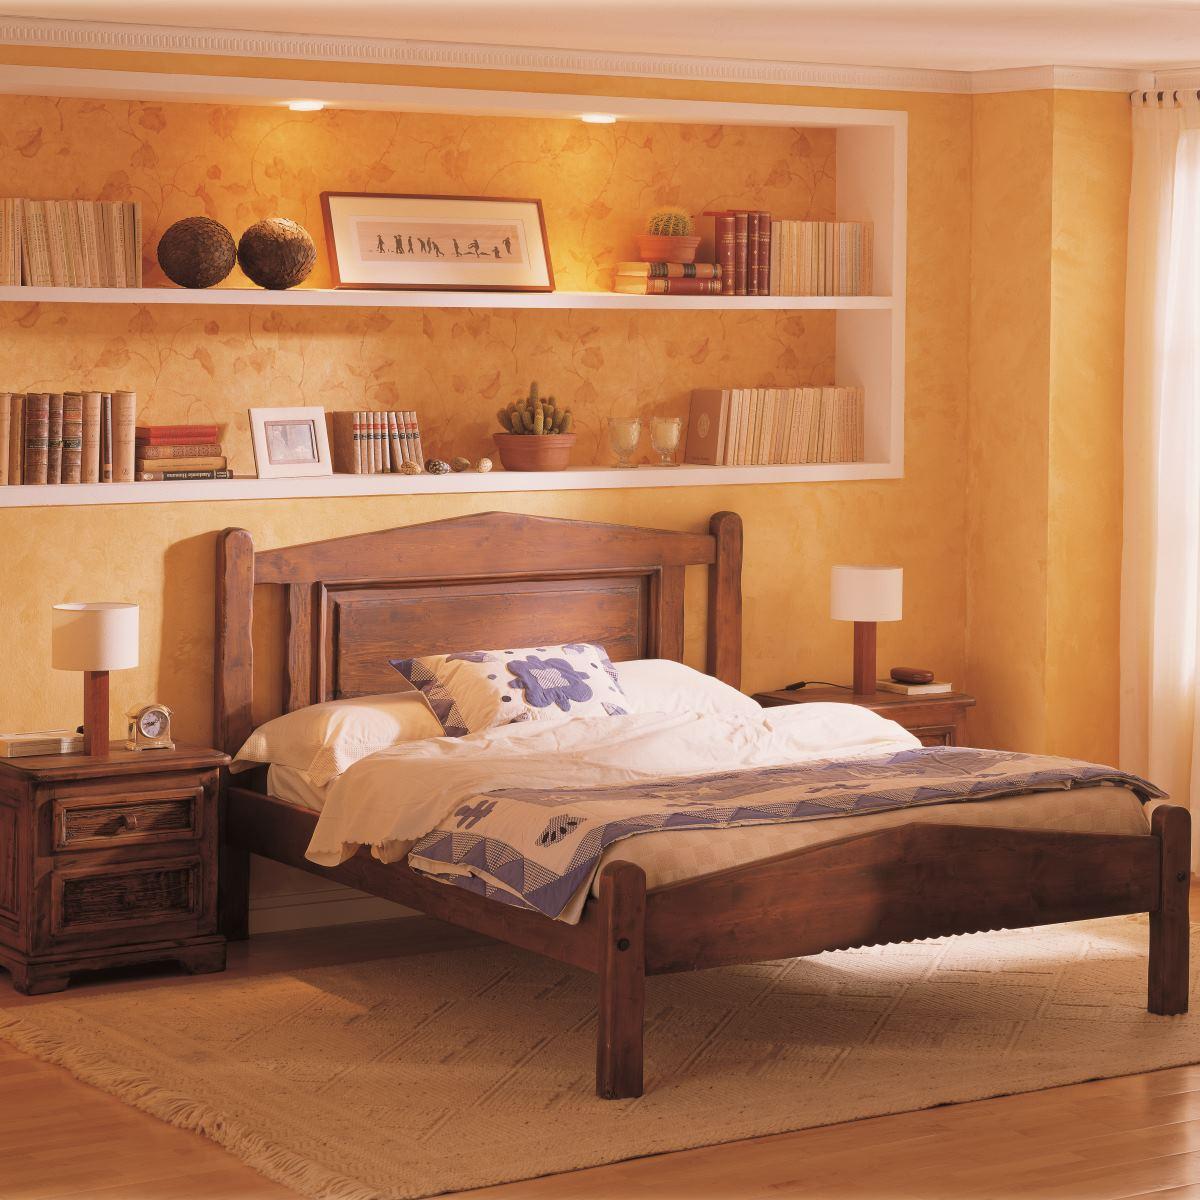 Cama rústica plafón de madera. Ecorústico: venta de muebles